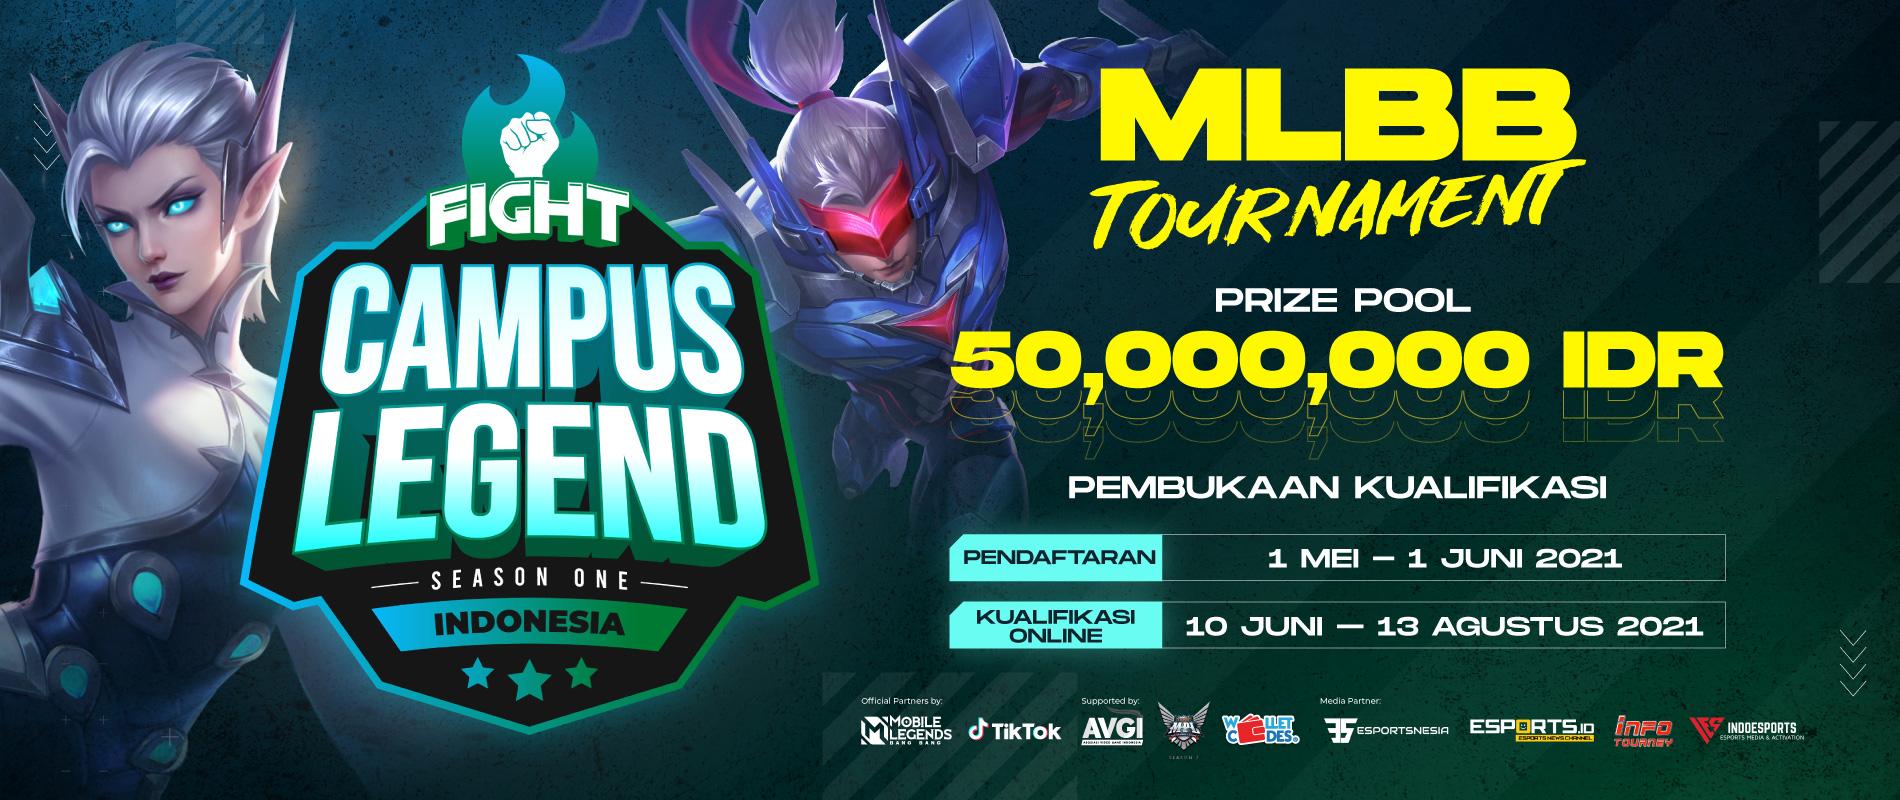 mobile-legends-fight-campus-legend-season-1